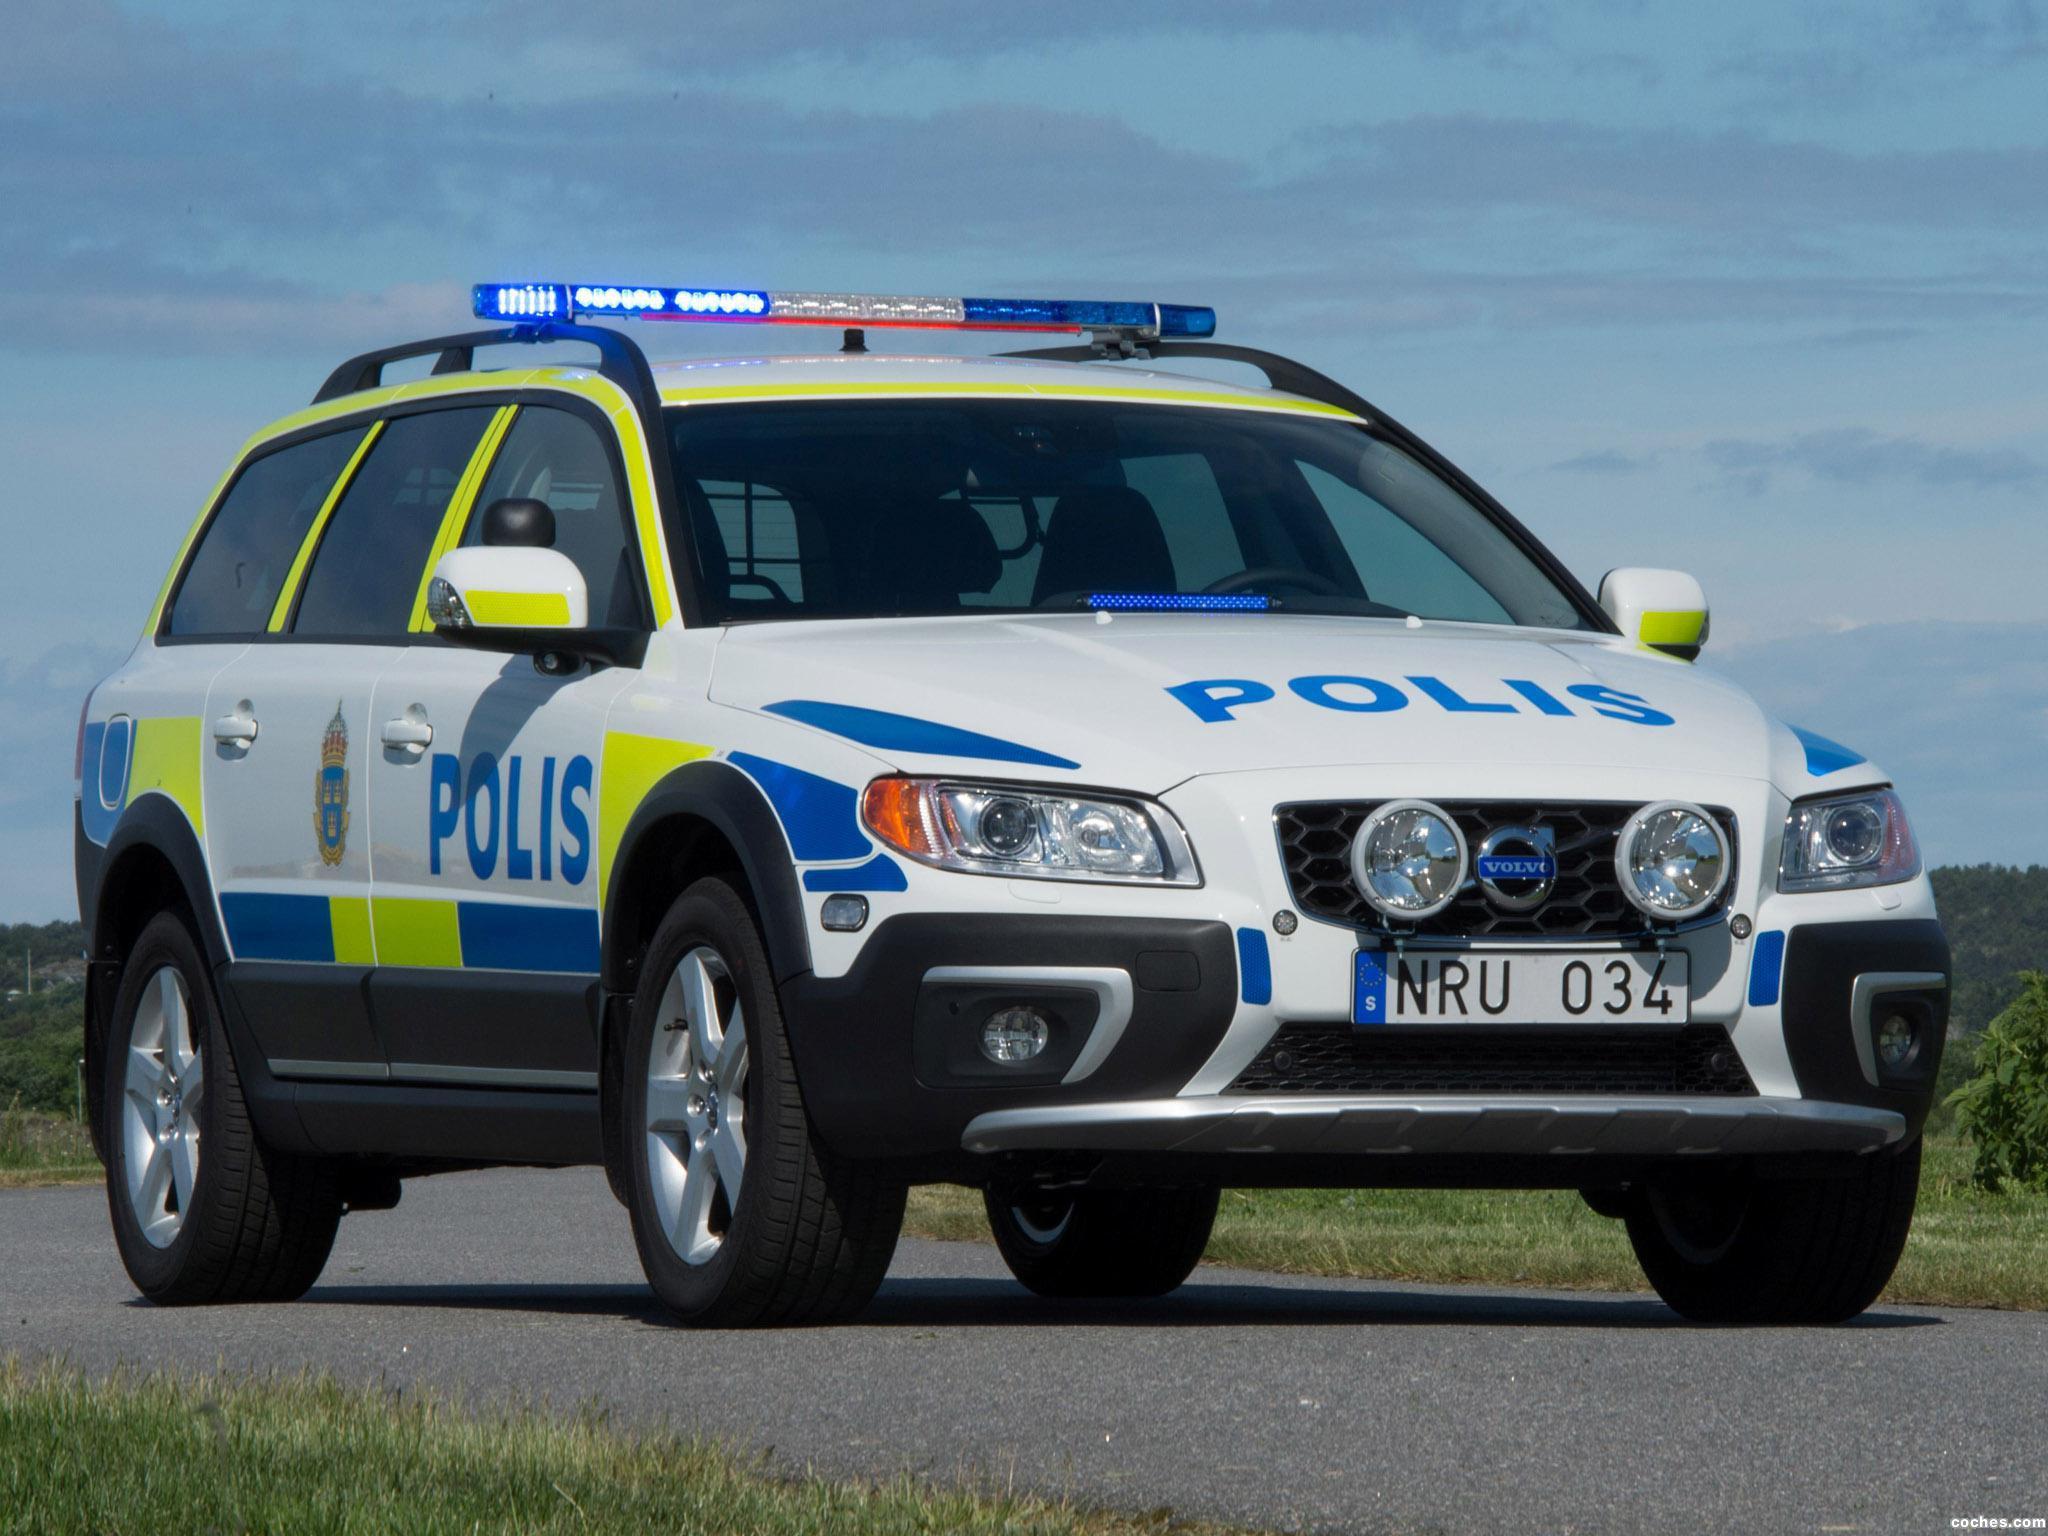 volvo_xc70-police-2013_r8